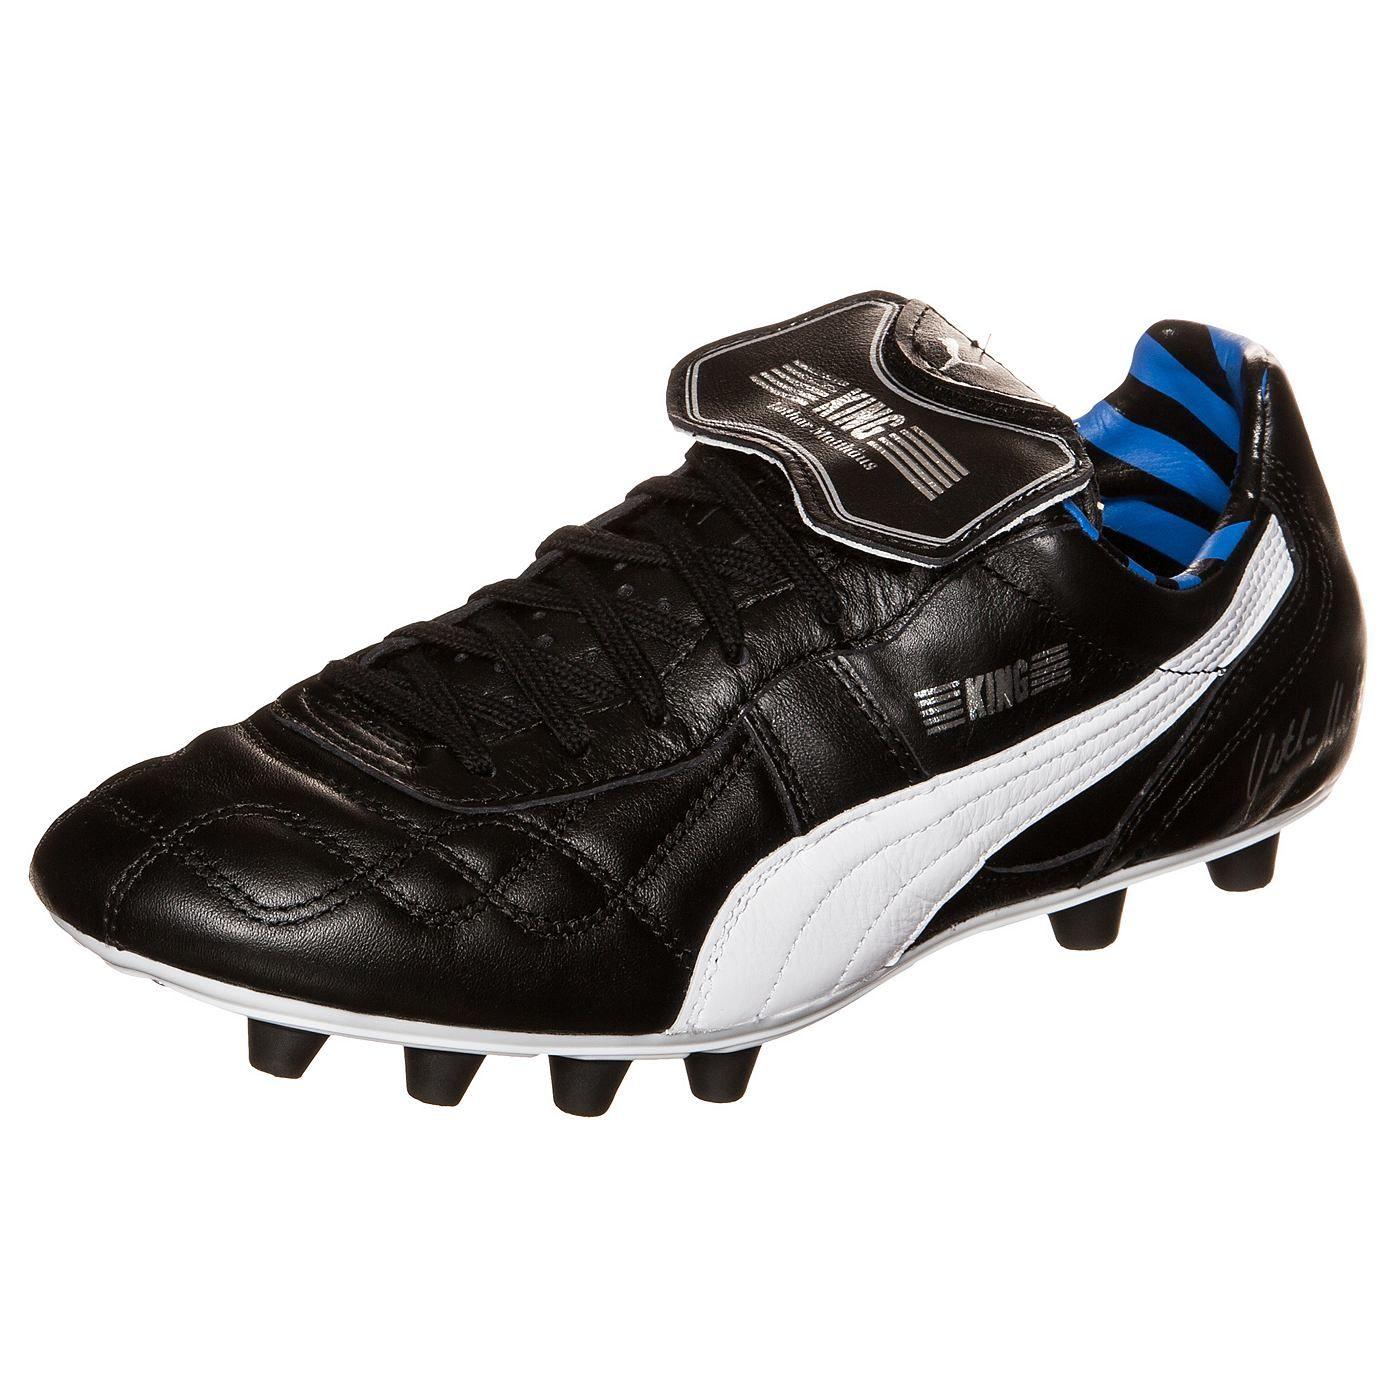 Puma KING LOTHAR MATTHAUS Zapatillas Futbol Soccer Cuero Negro para Hombre Edicion Especial l2pWs